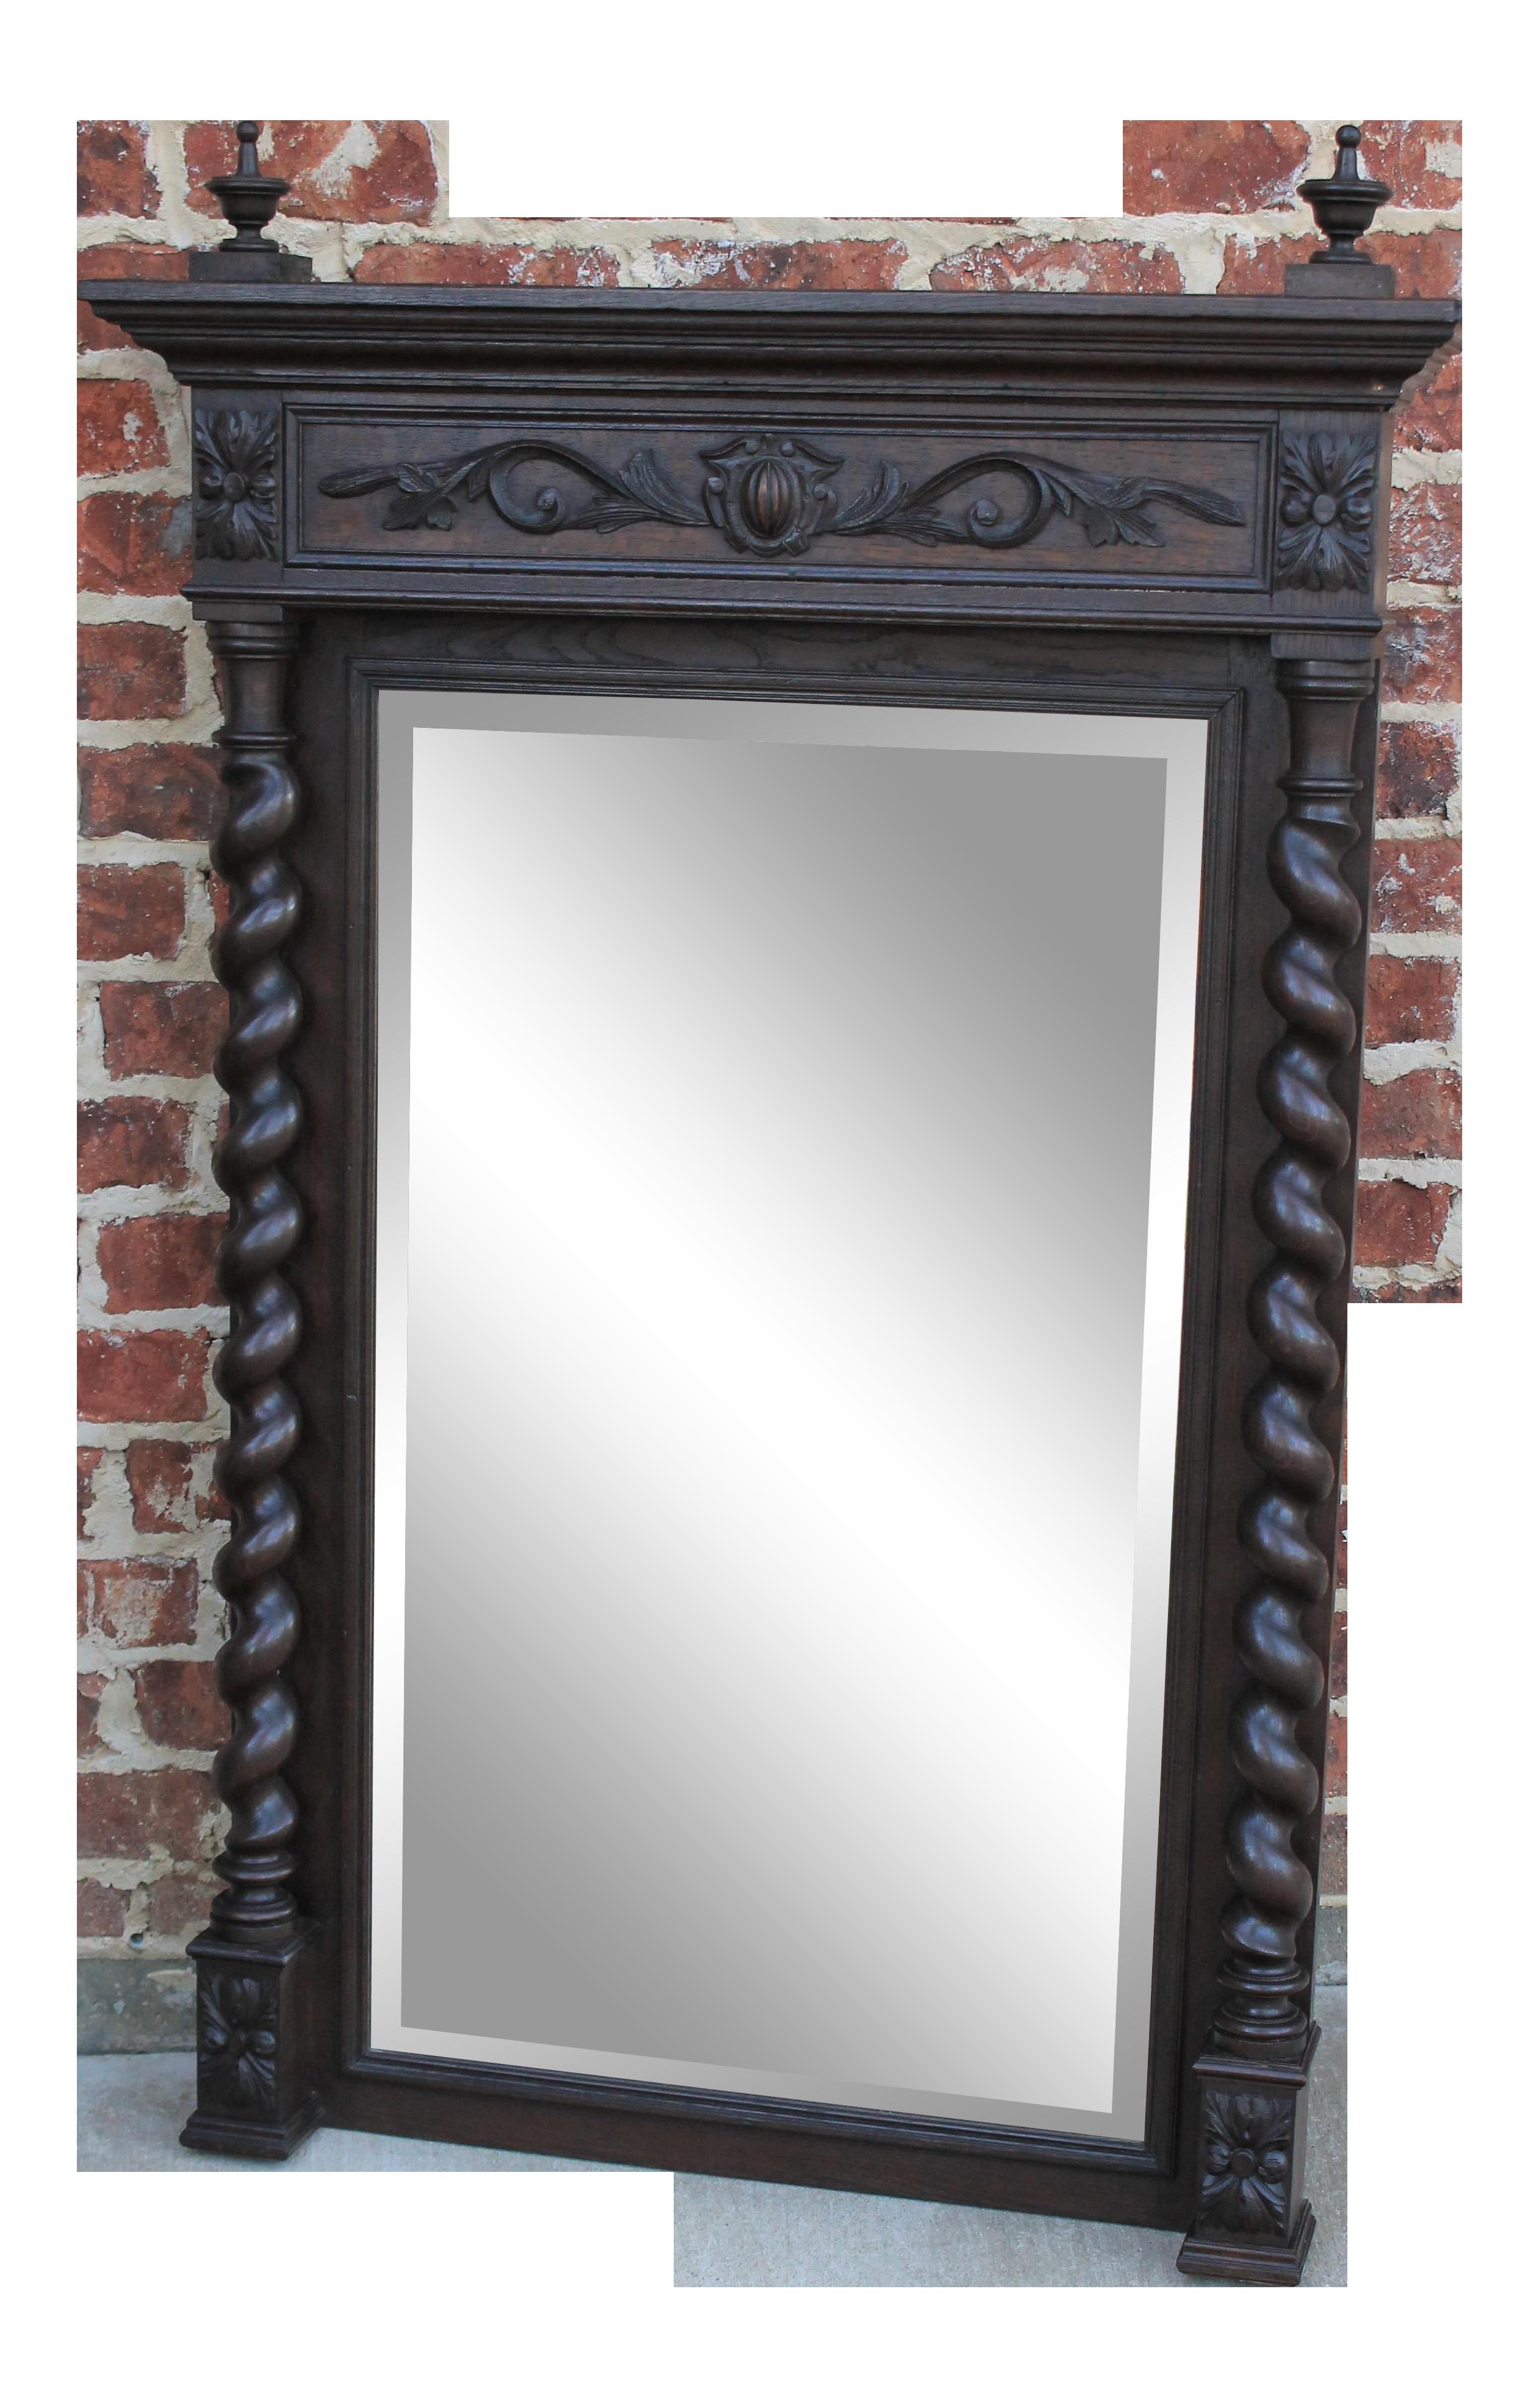 Antique English Oak Mirror Barley Twist Beveled Wall Pier Mantel Mirror Chairish